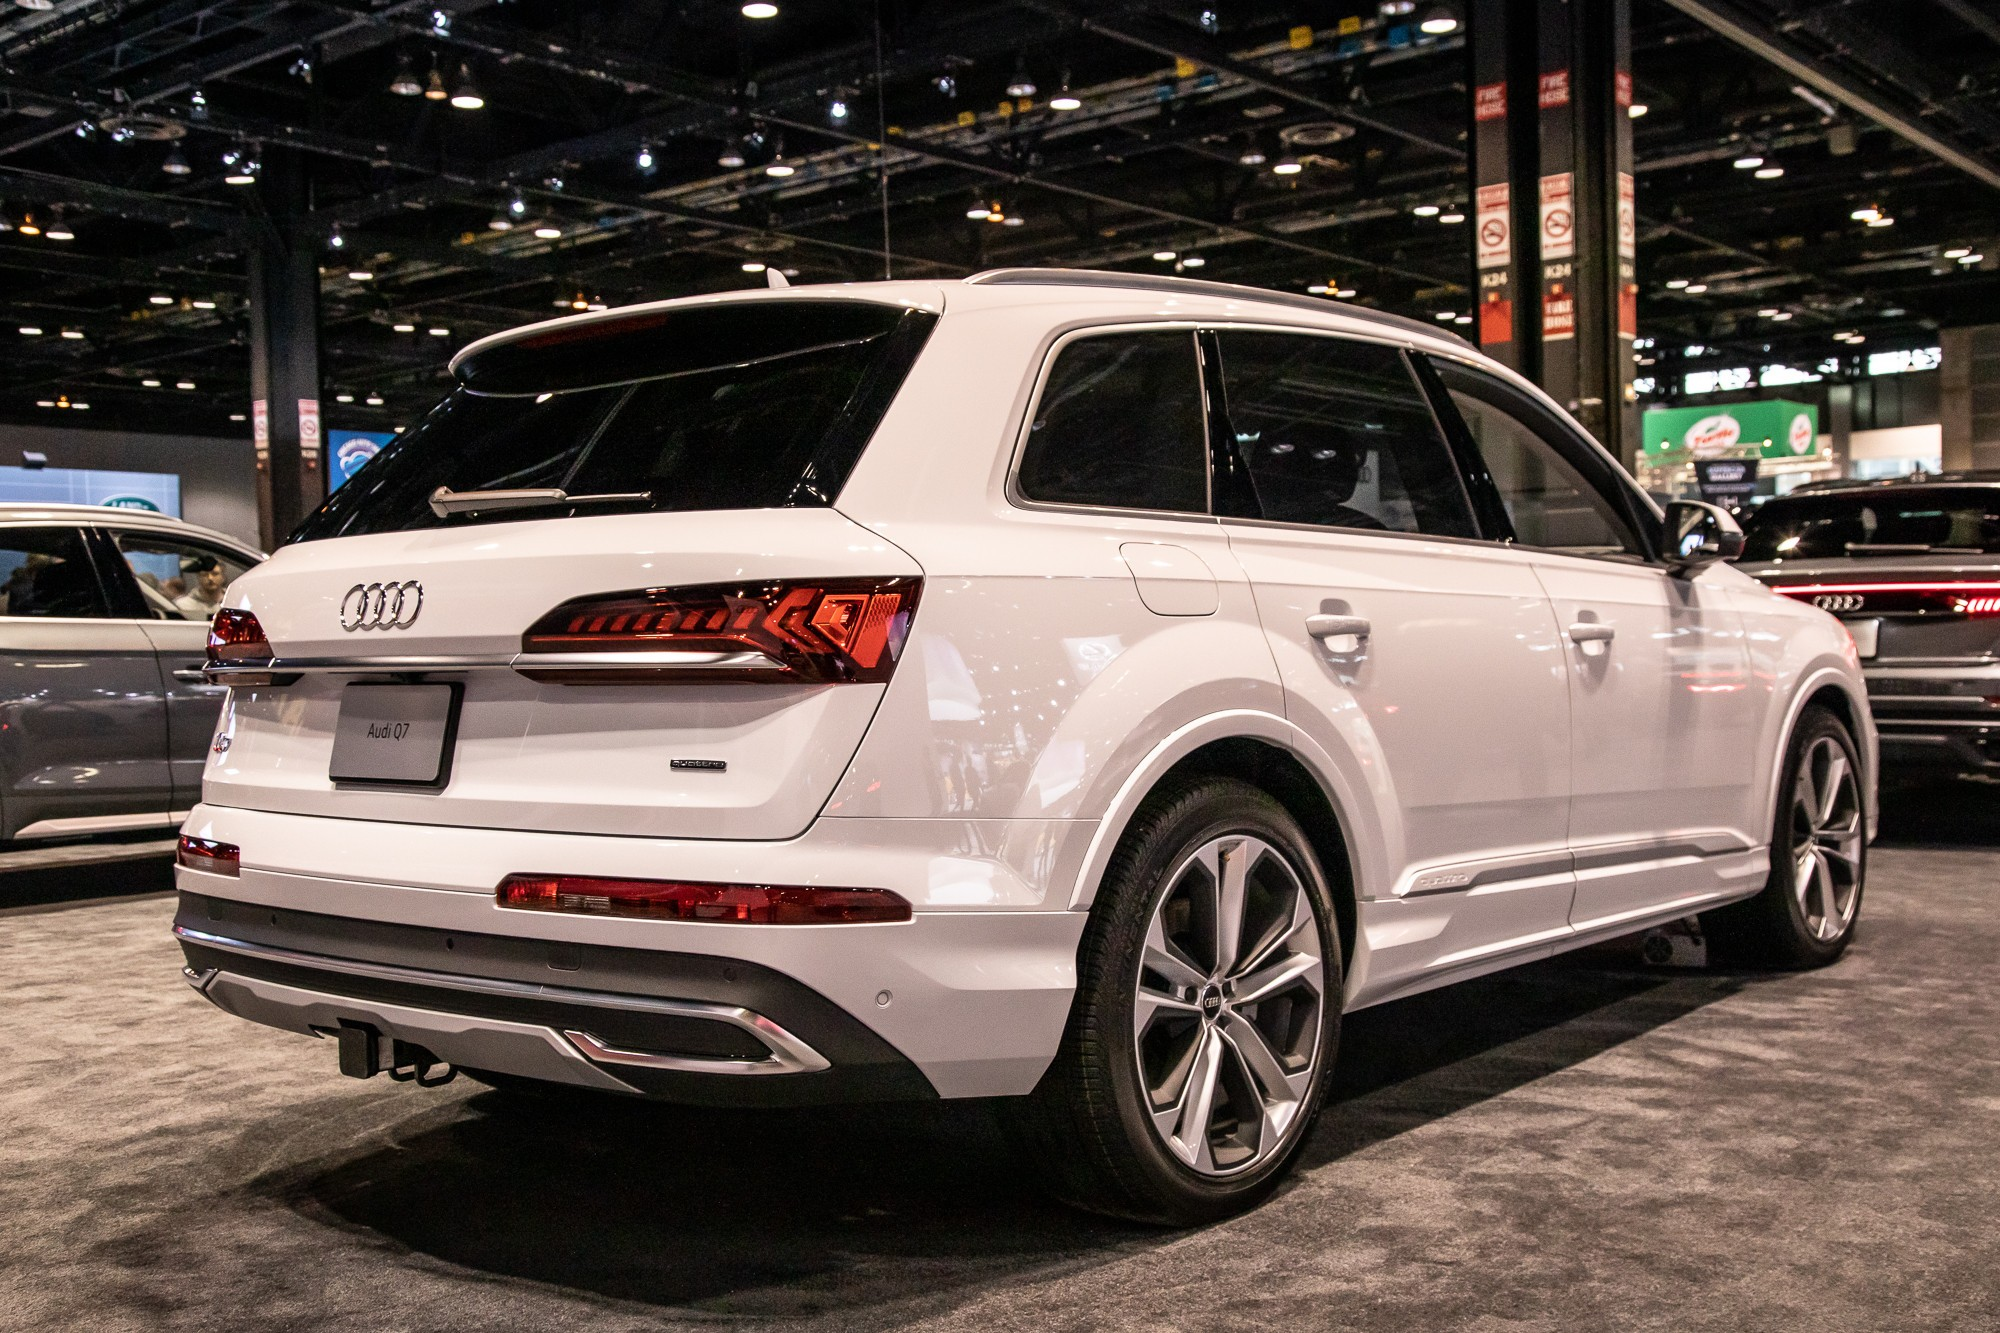 audi-q7-2020-1-angle--exterior--rear--white.jpg